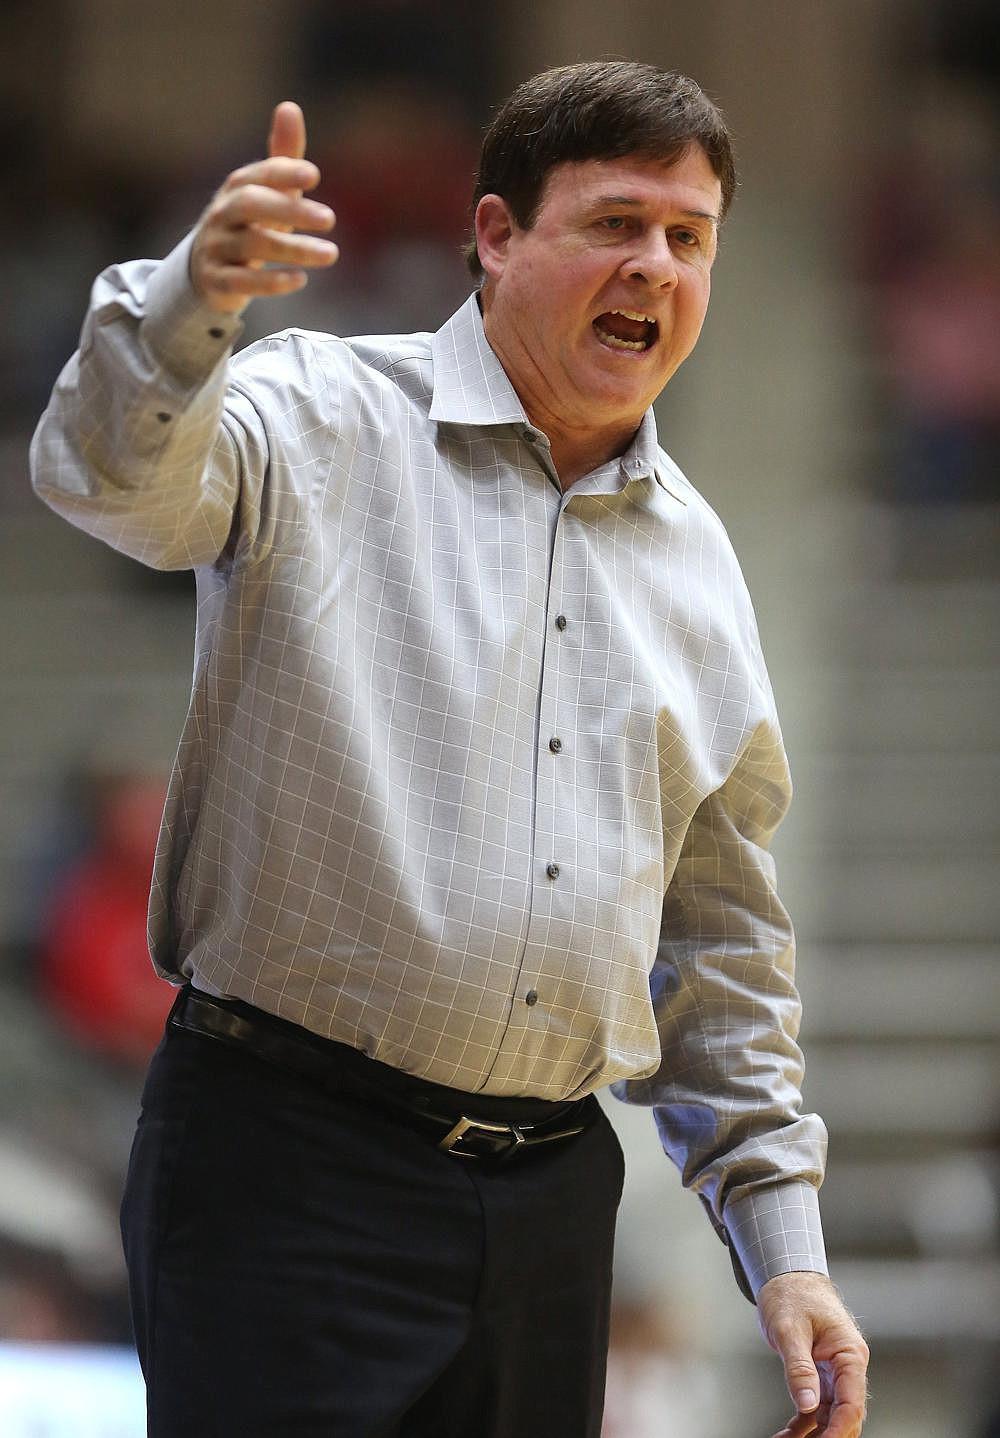 UALR head coach Joe Foley calls a play during the third quarter of the Trojans' 68-55 win on Saturday, Feb. 2, 2019, at the Jack Stephens Center in Little Rock.  (Arkansas Democrat-Gazette/THOMAS METTHE)